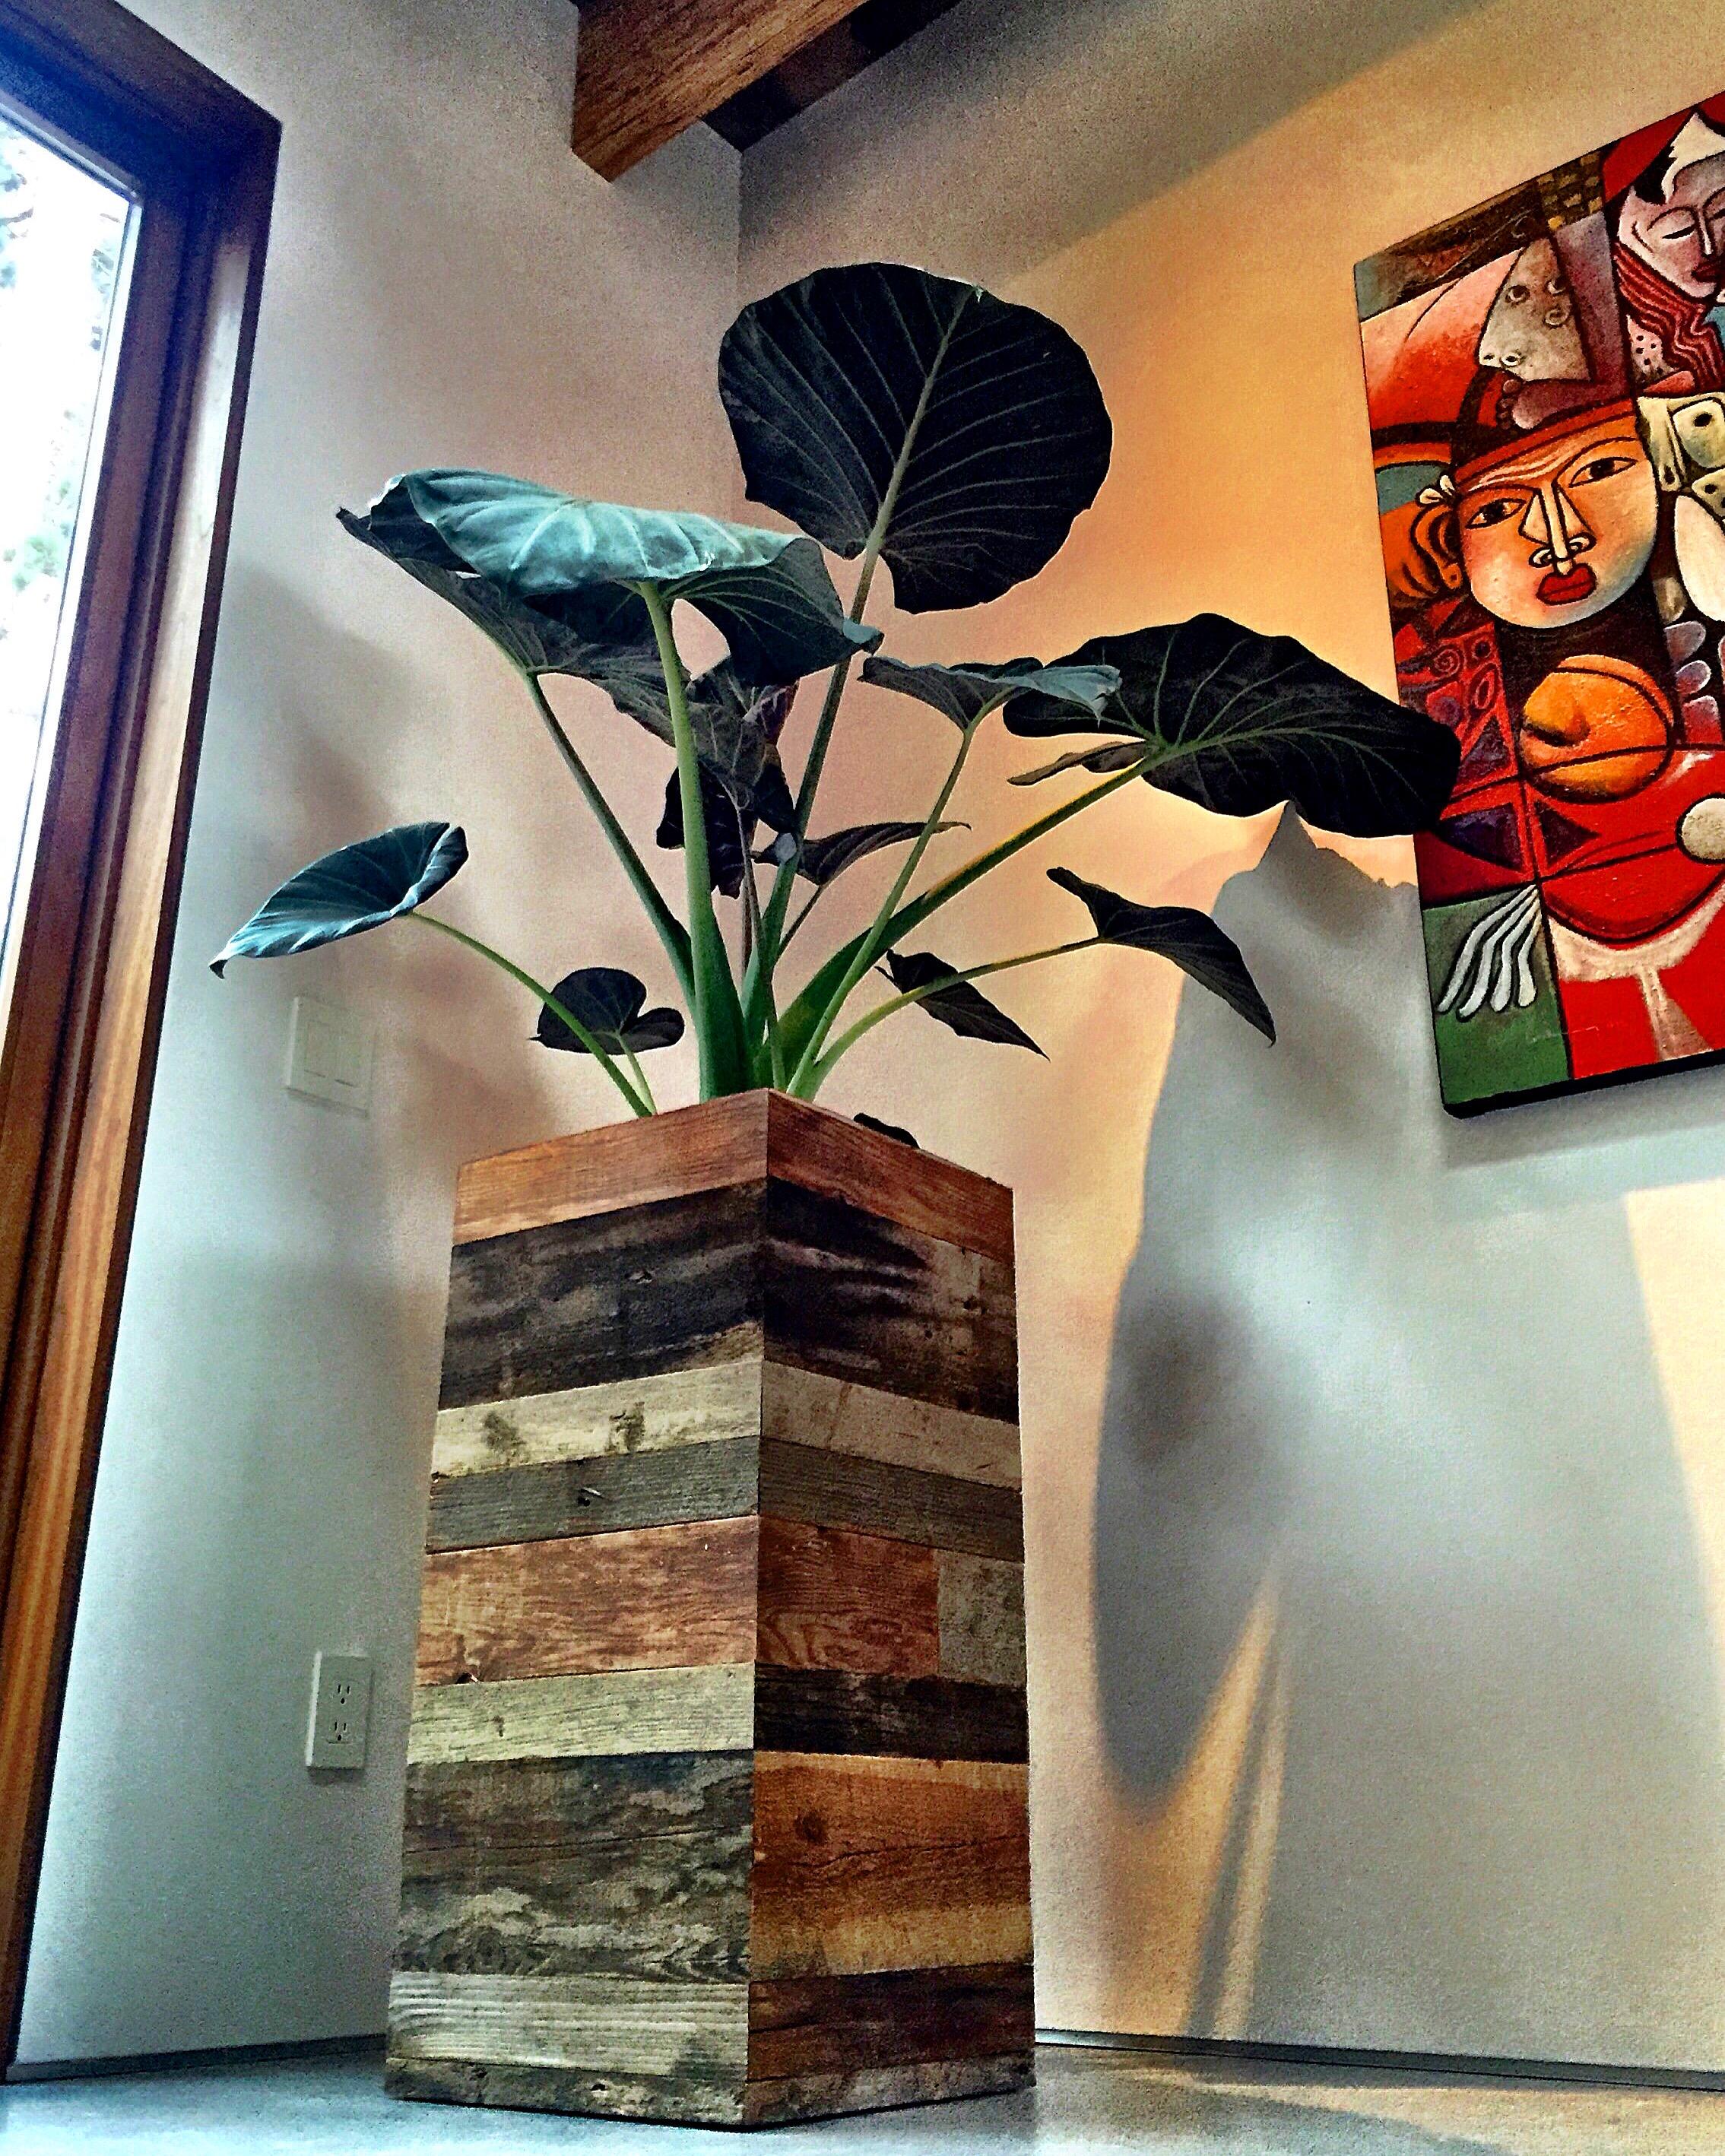 Barn wood planter box I designed and built. Elephant Ear tropical plant.